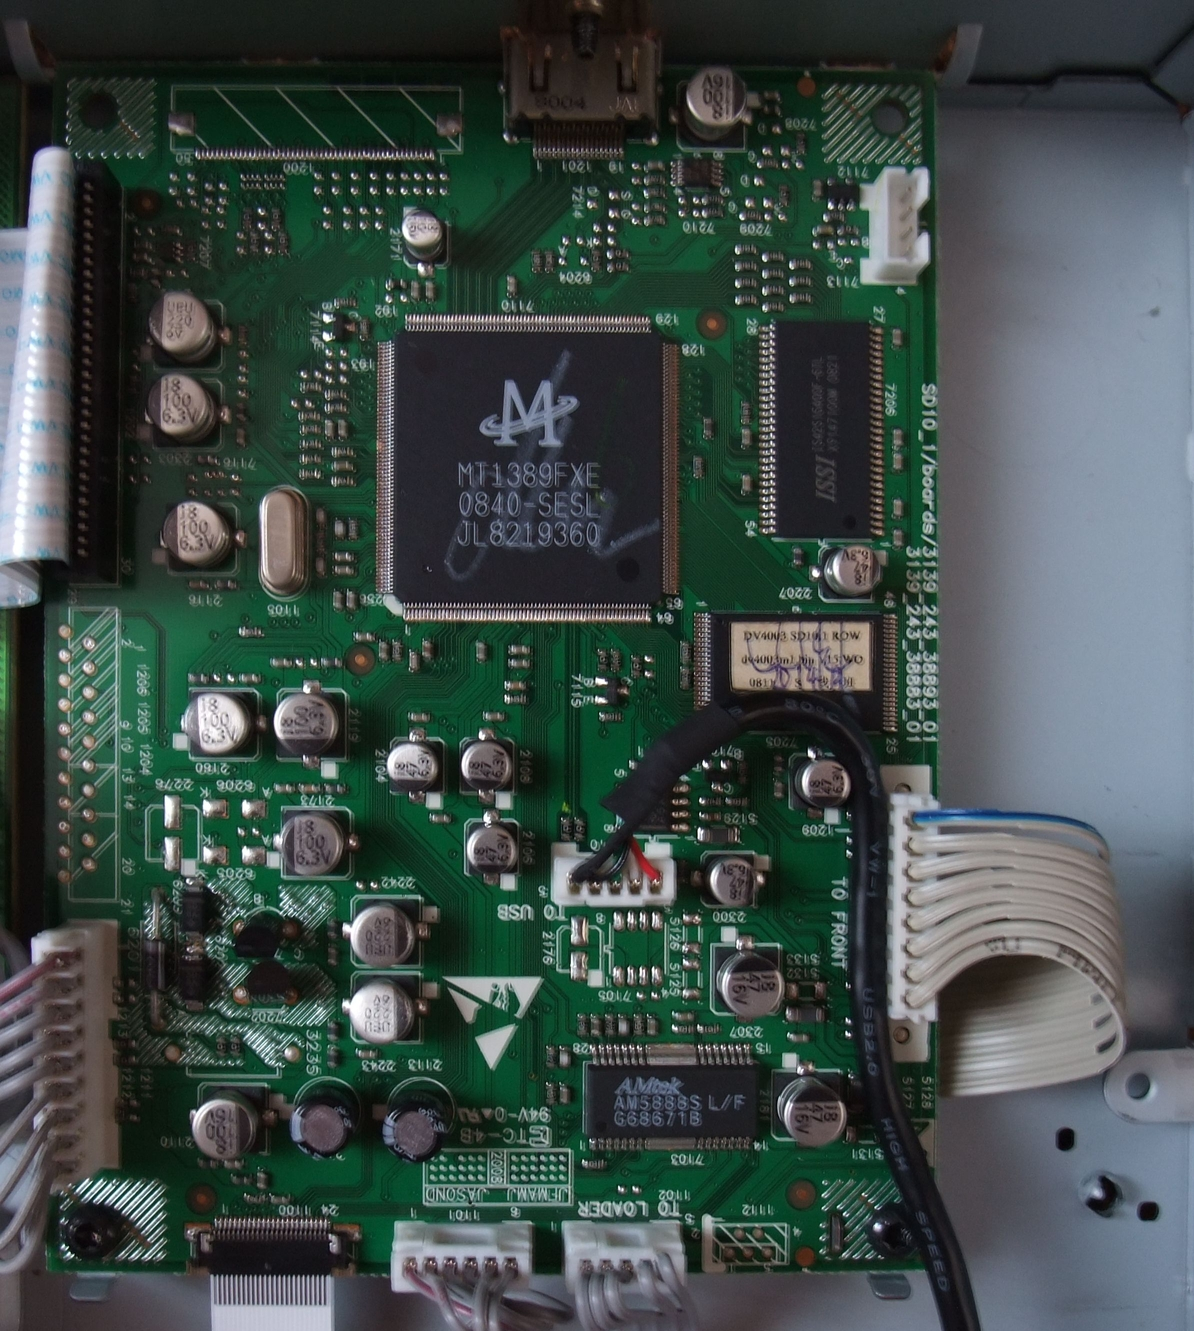 Marantz DV4003 controller